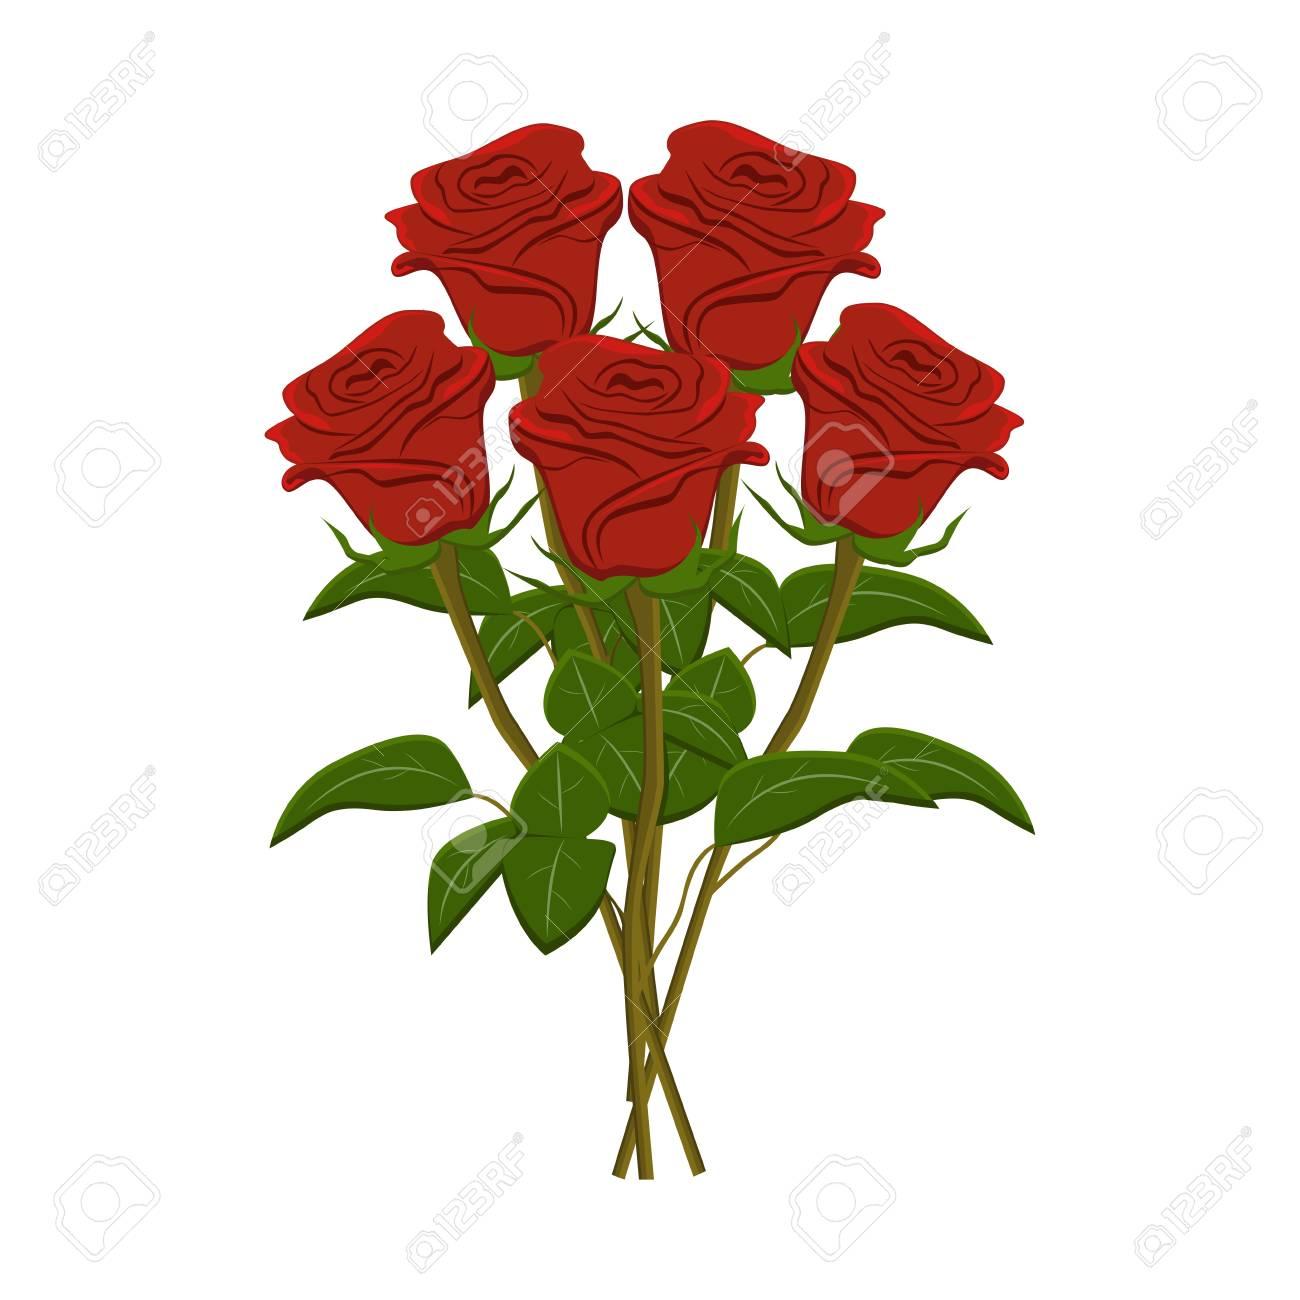 clip art bunch of red roses vector illustration royalty free rh 123rf com rose vectoriel gratuit rose vector png